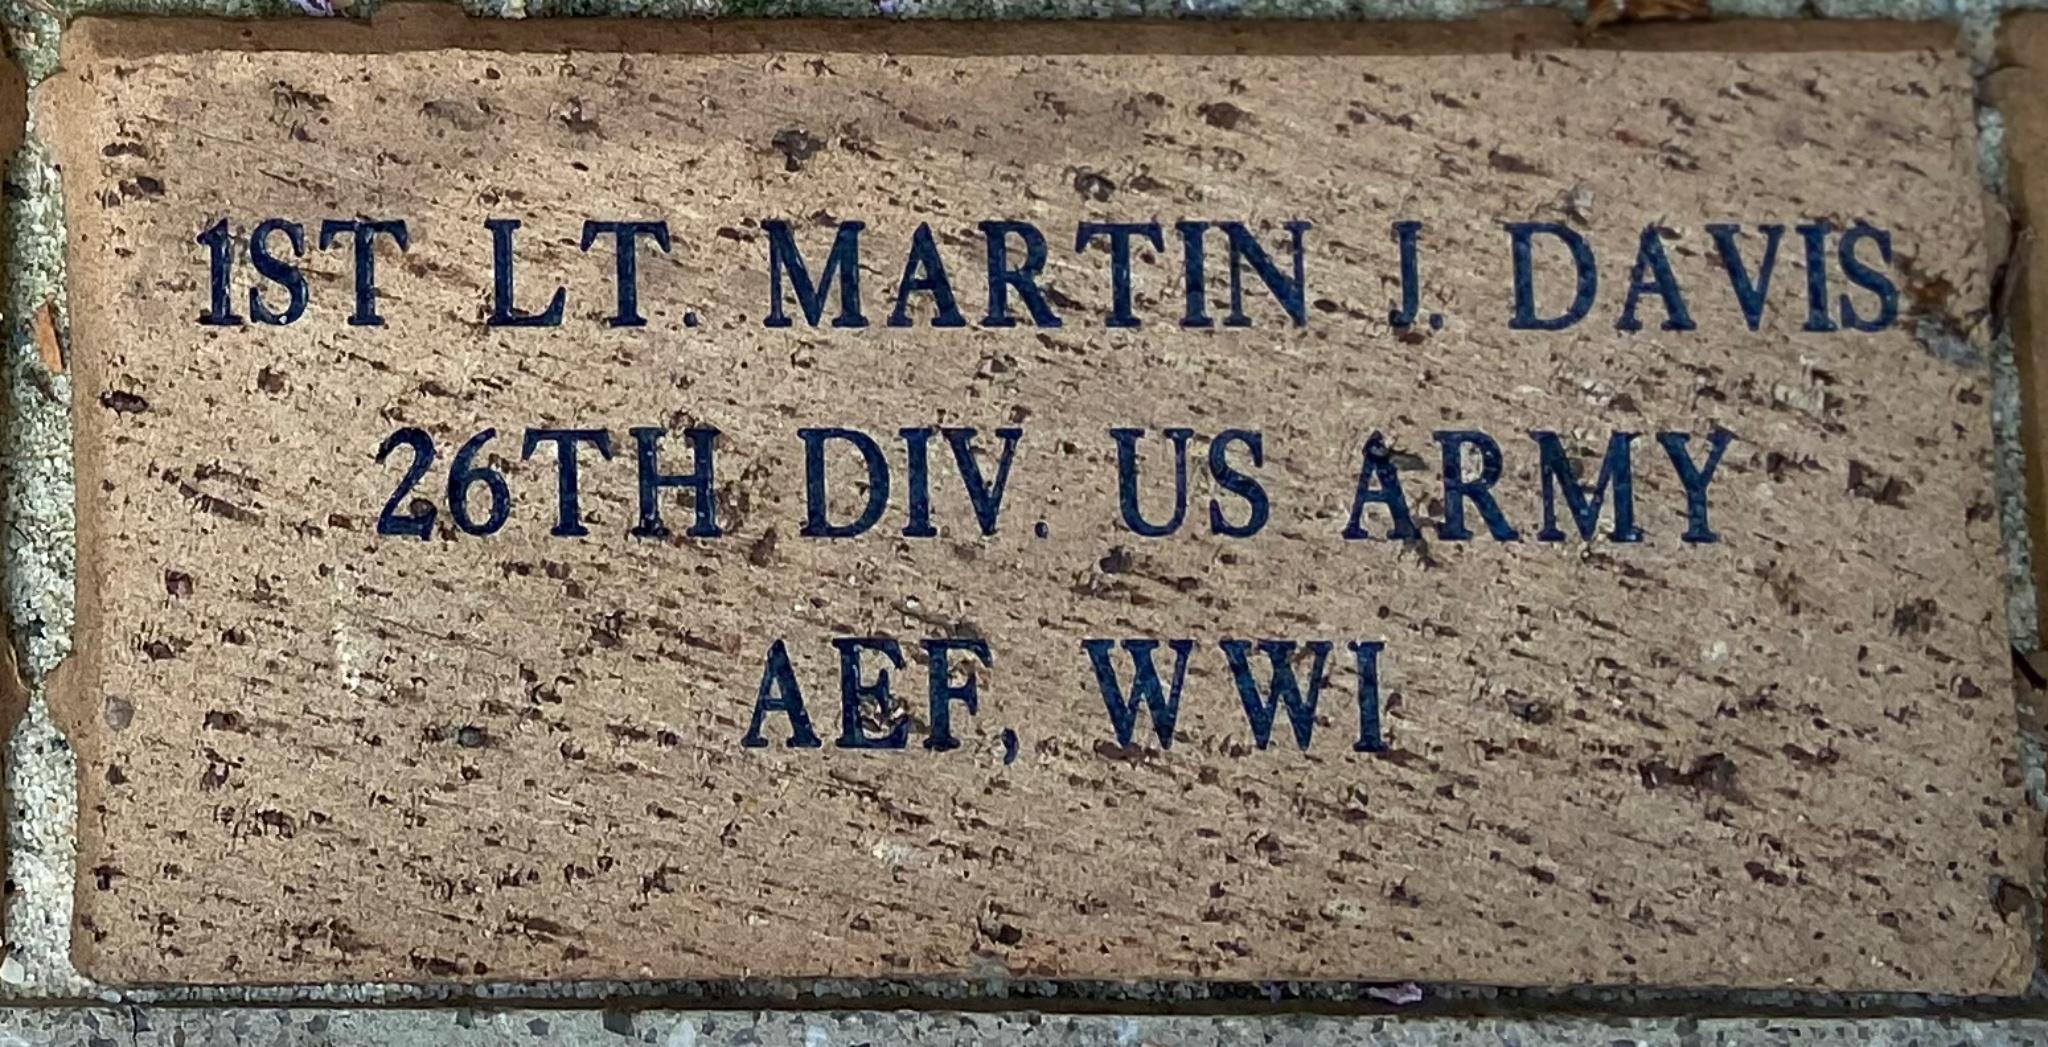 1ST LT. MARTIN J. DAVIS 26TH DIV. US ARMY AEF, WWI